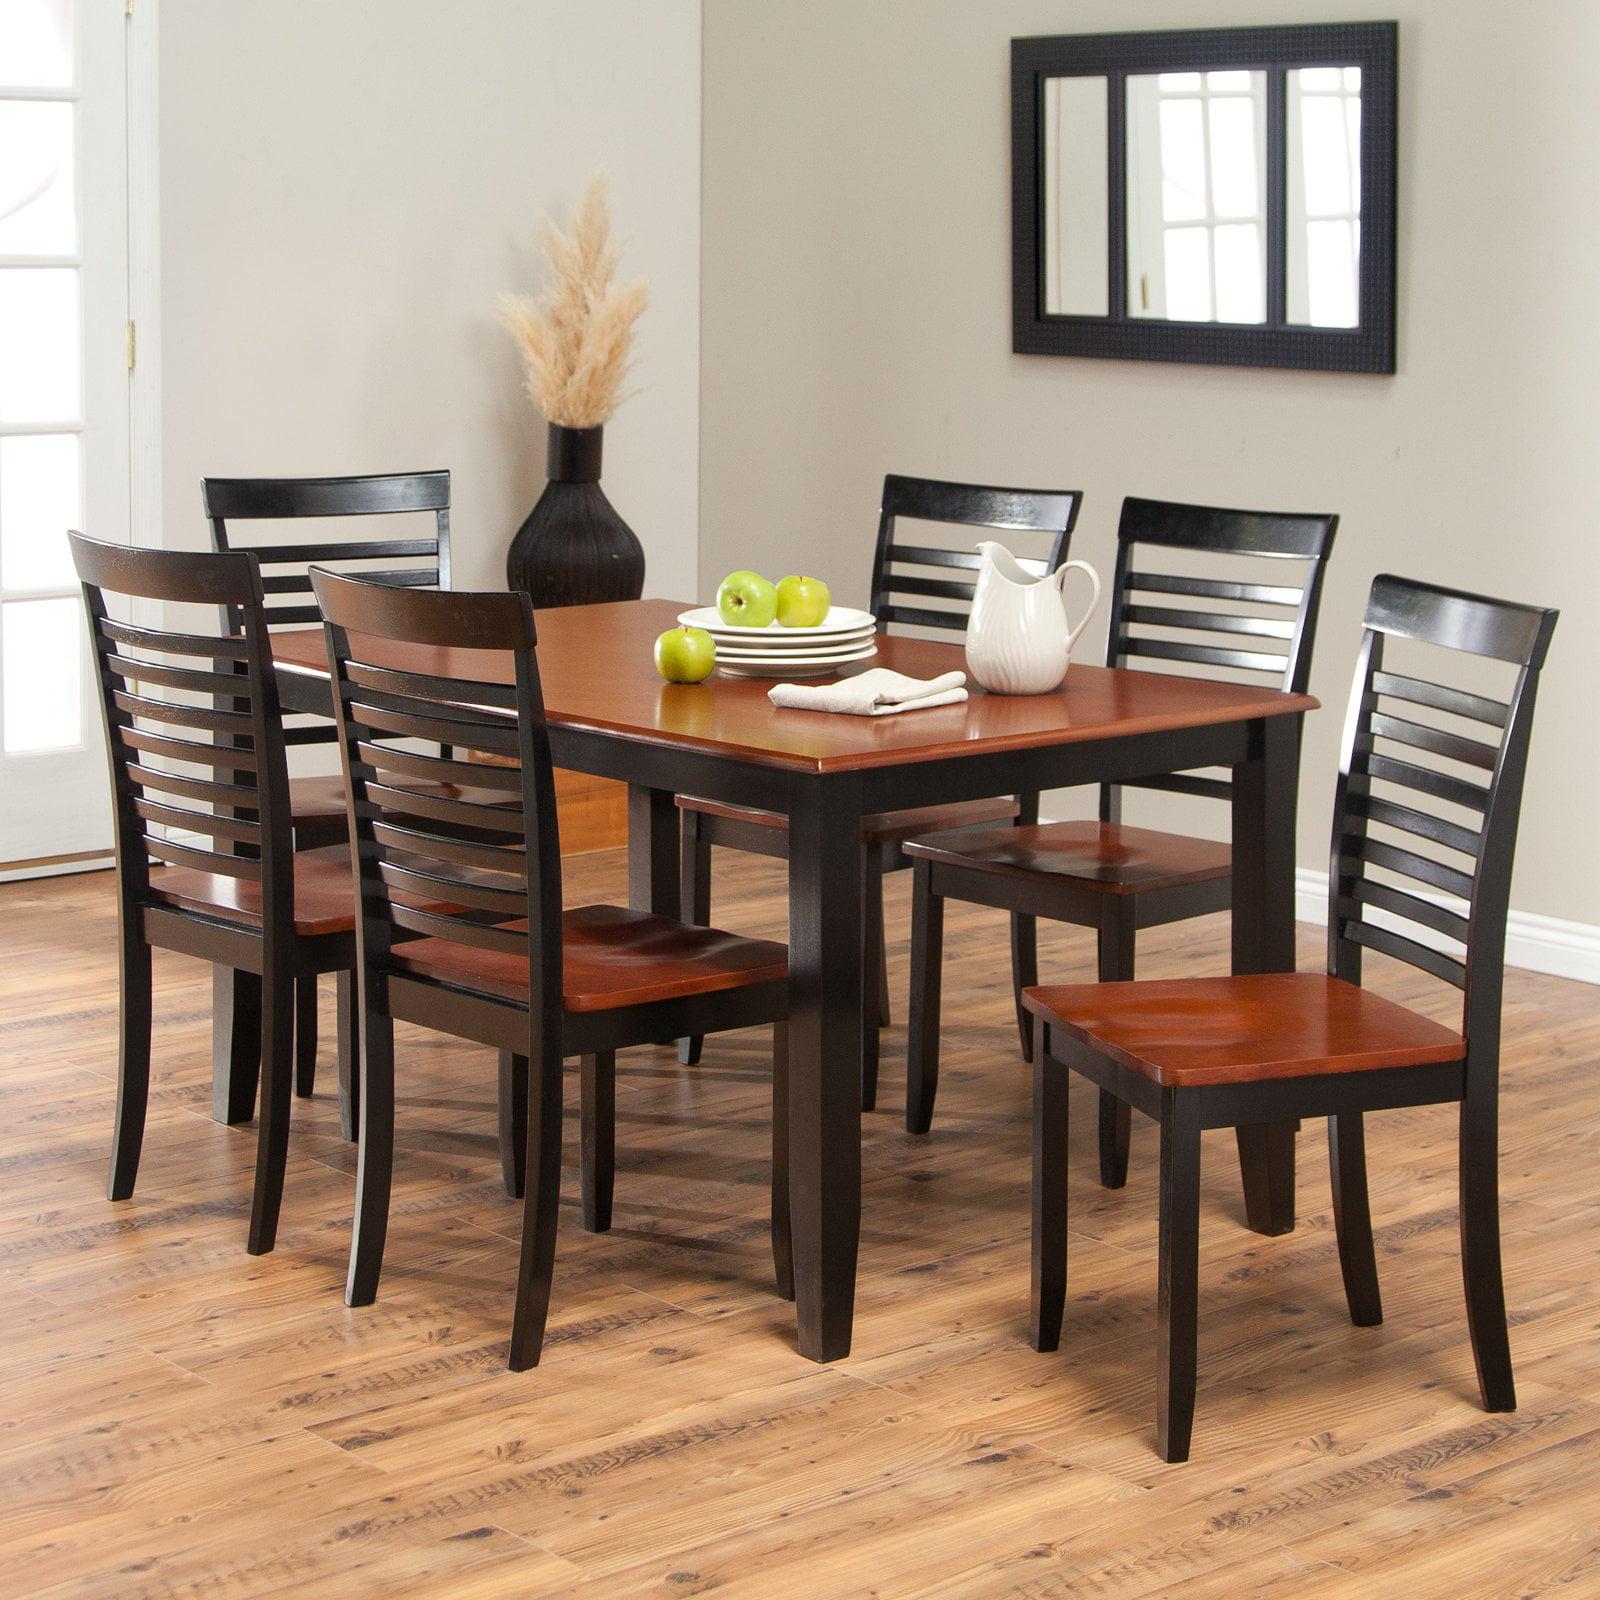 Boraam bloomington dining table set black cherry walmart com